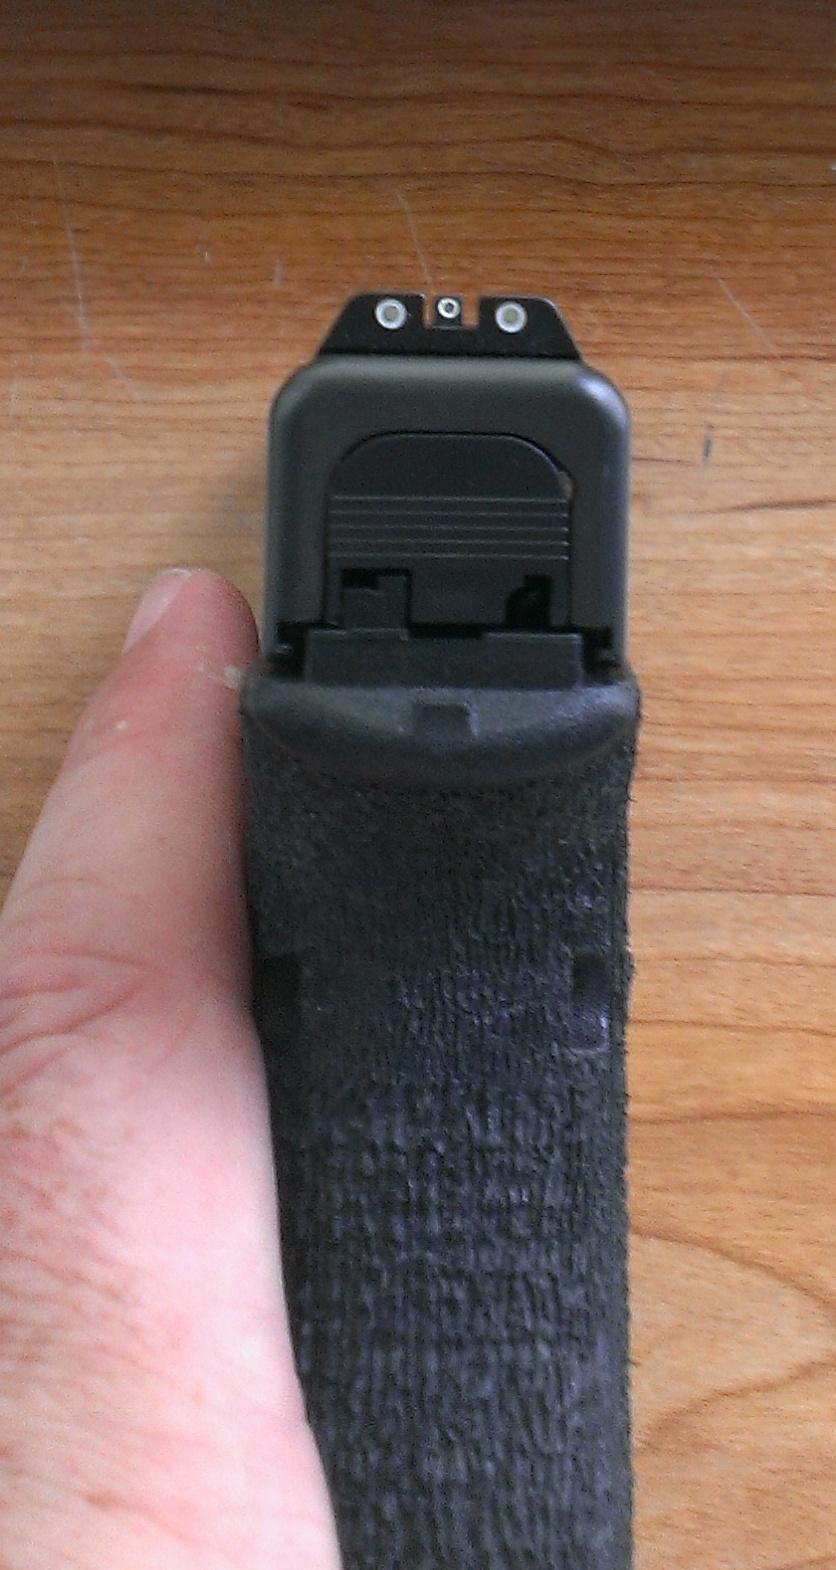 Glock-made night sights vs. Trijicon HD-imag0029.jpg